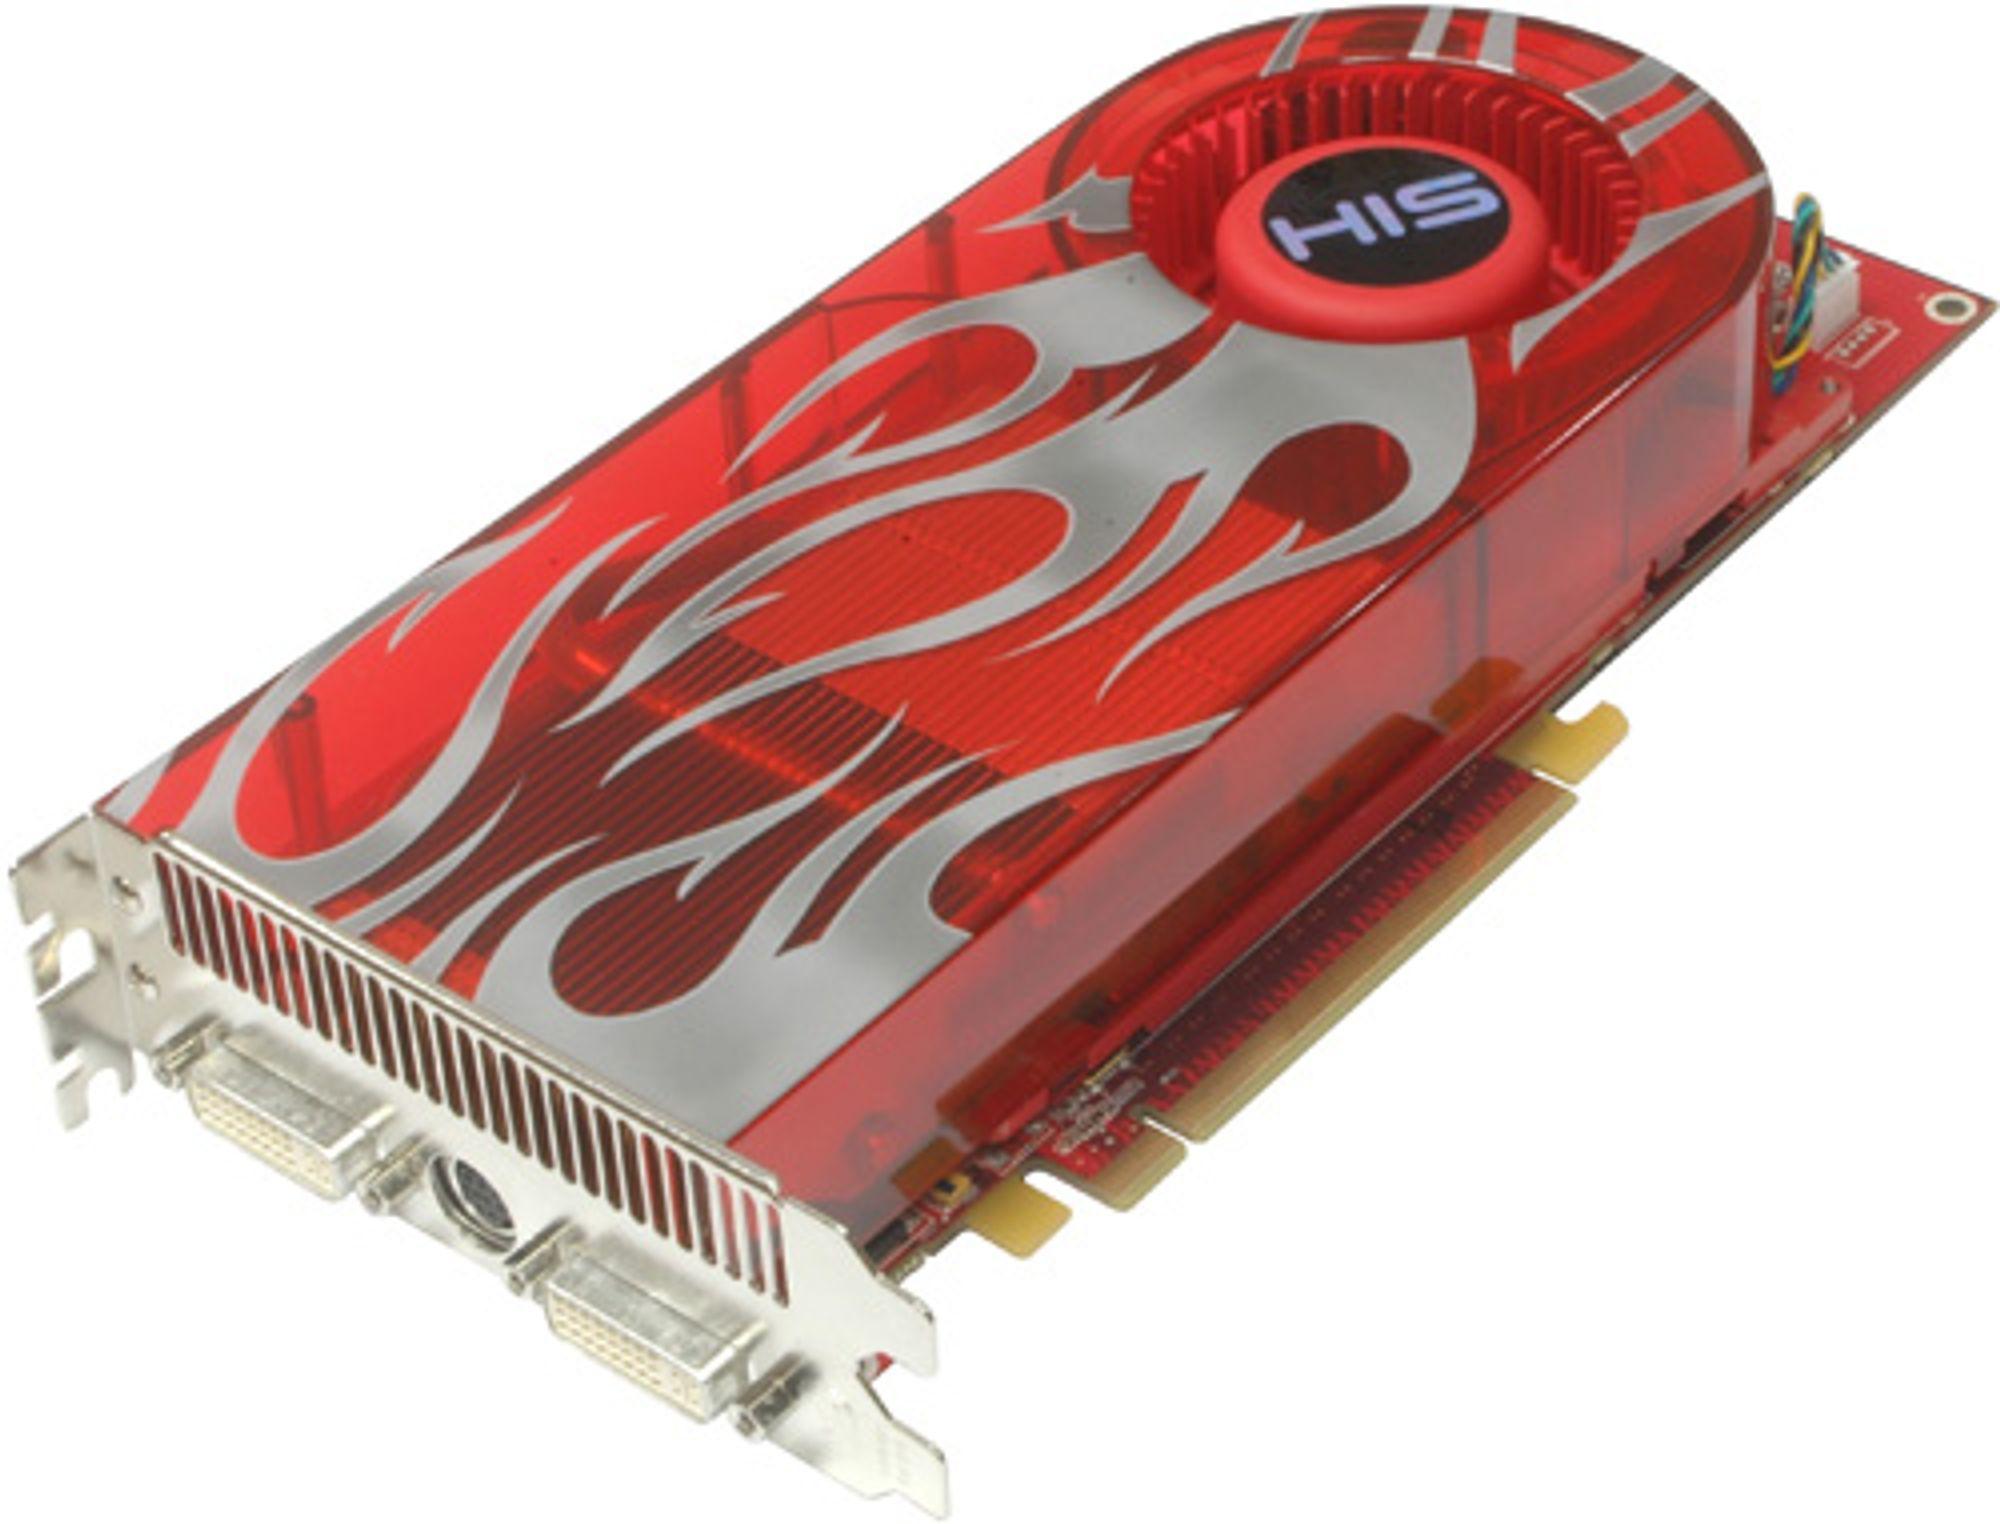 Radeon HD 2900 XT